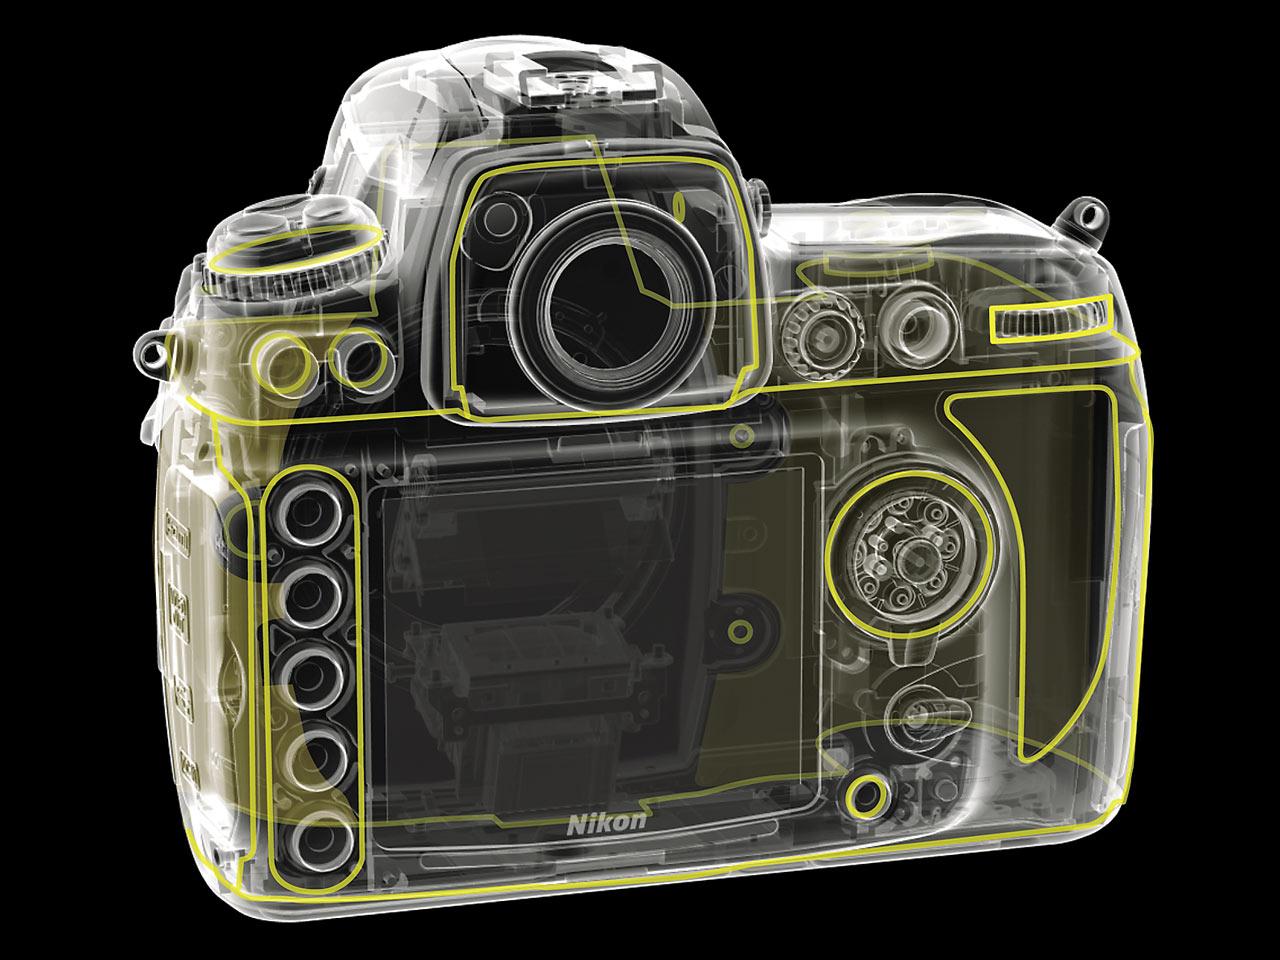 Semi-professional cameras